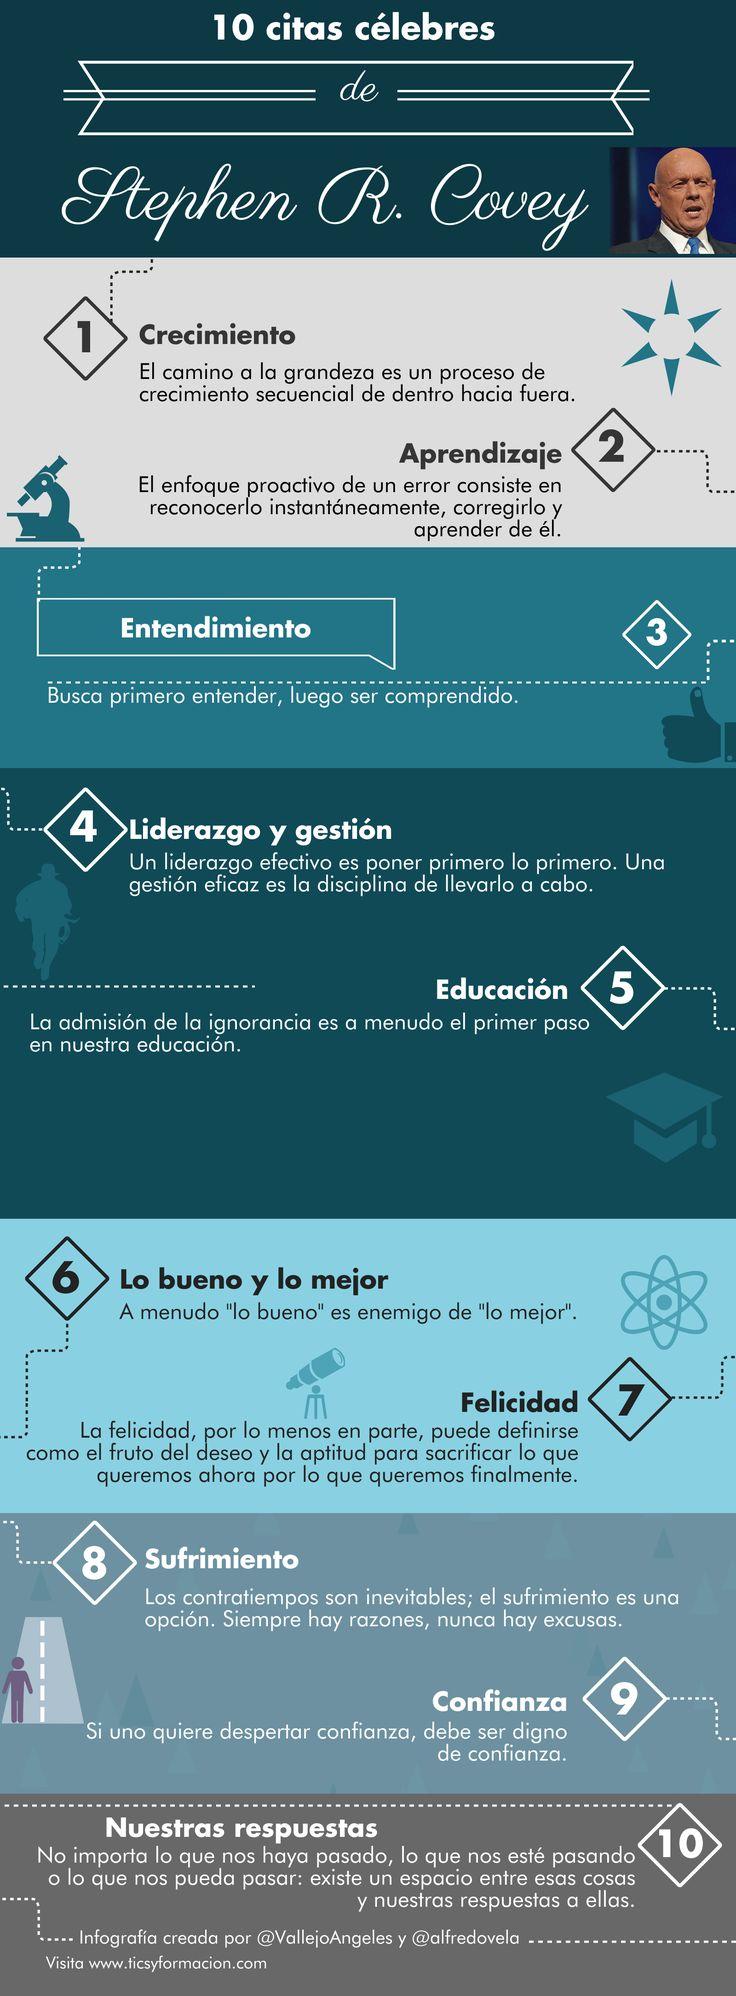 10 Citas célebres de Stephen R. Covey. #inteligenciaemocional #estudiantes #umayor